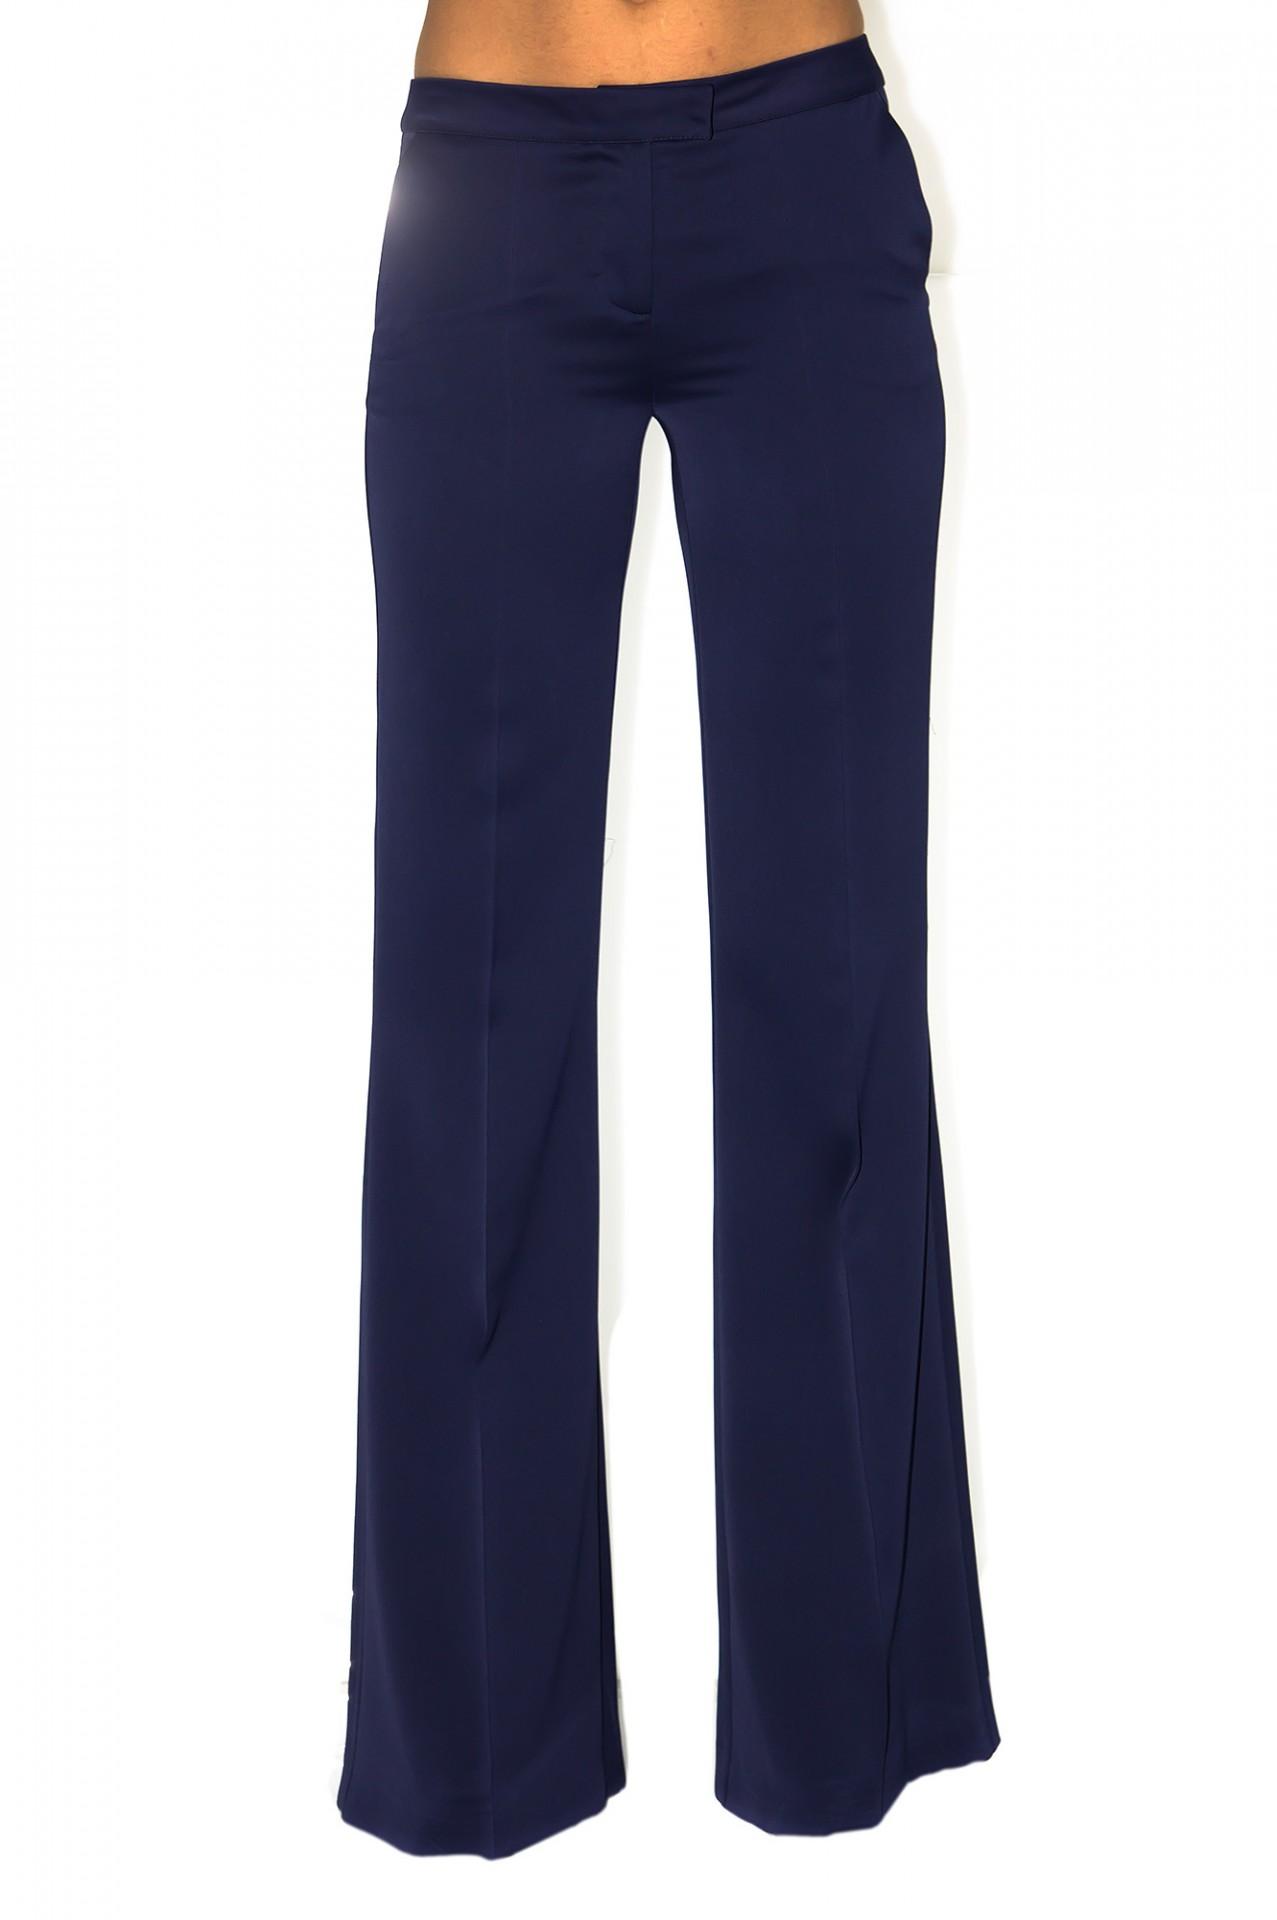 pantalon large en crepe satin bleu marine stefanie renoma. Black Bedroom Furniture Sets. Home Design Ideas